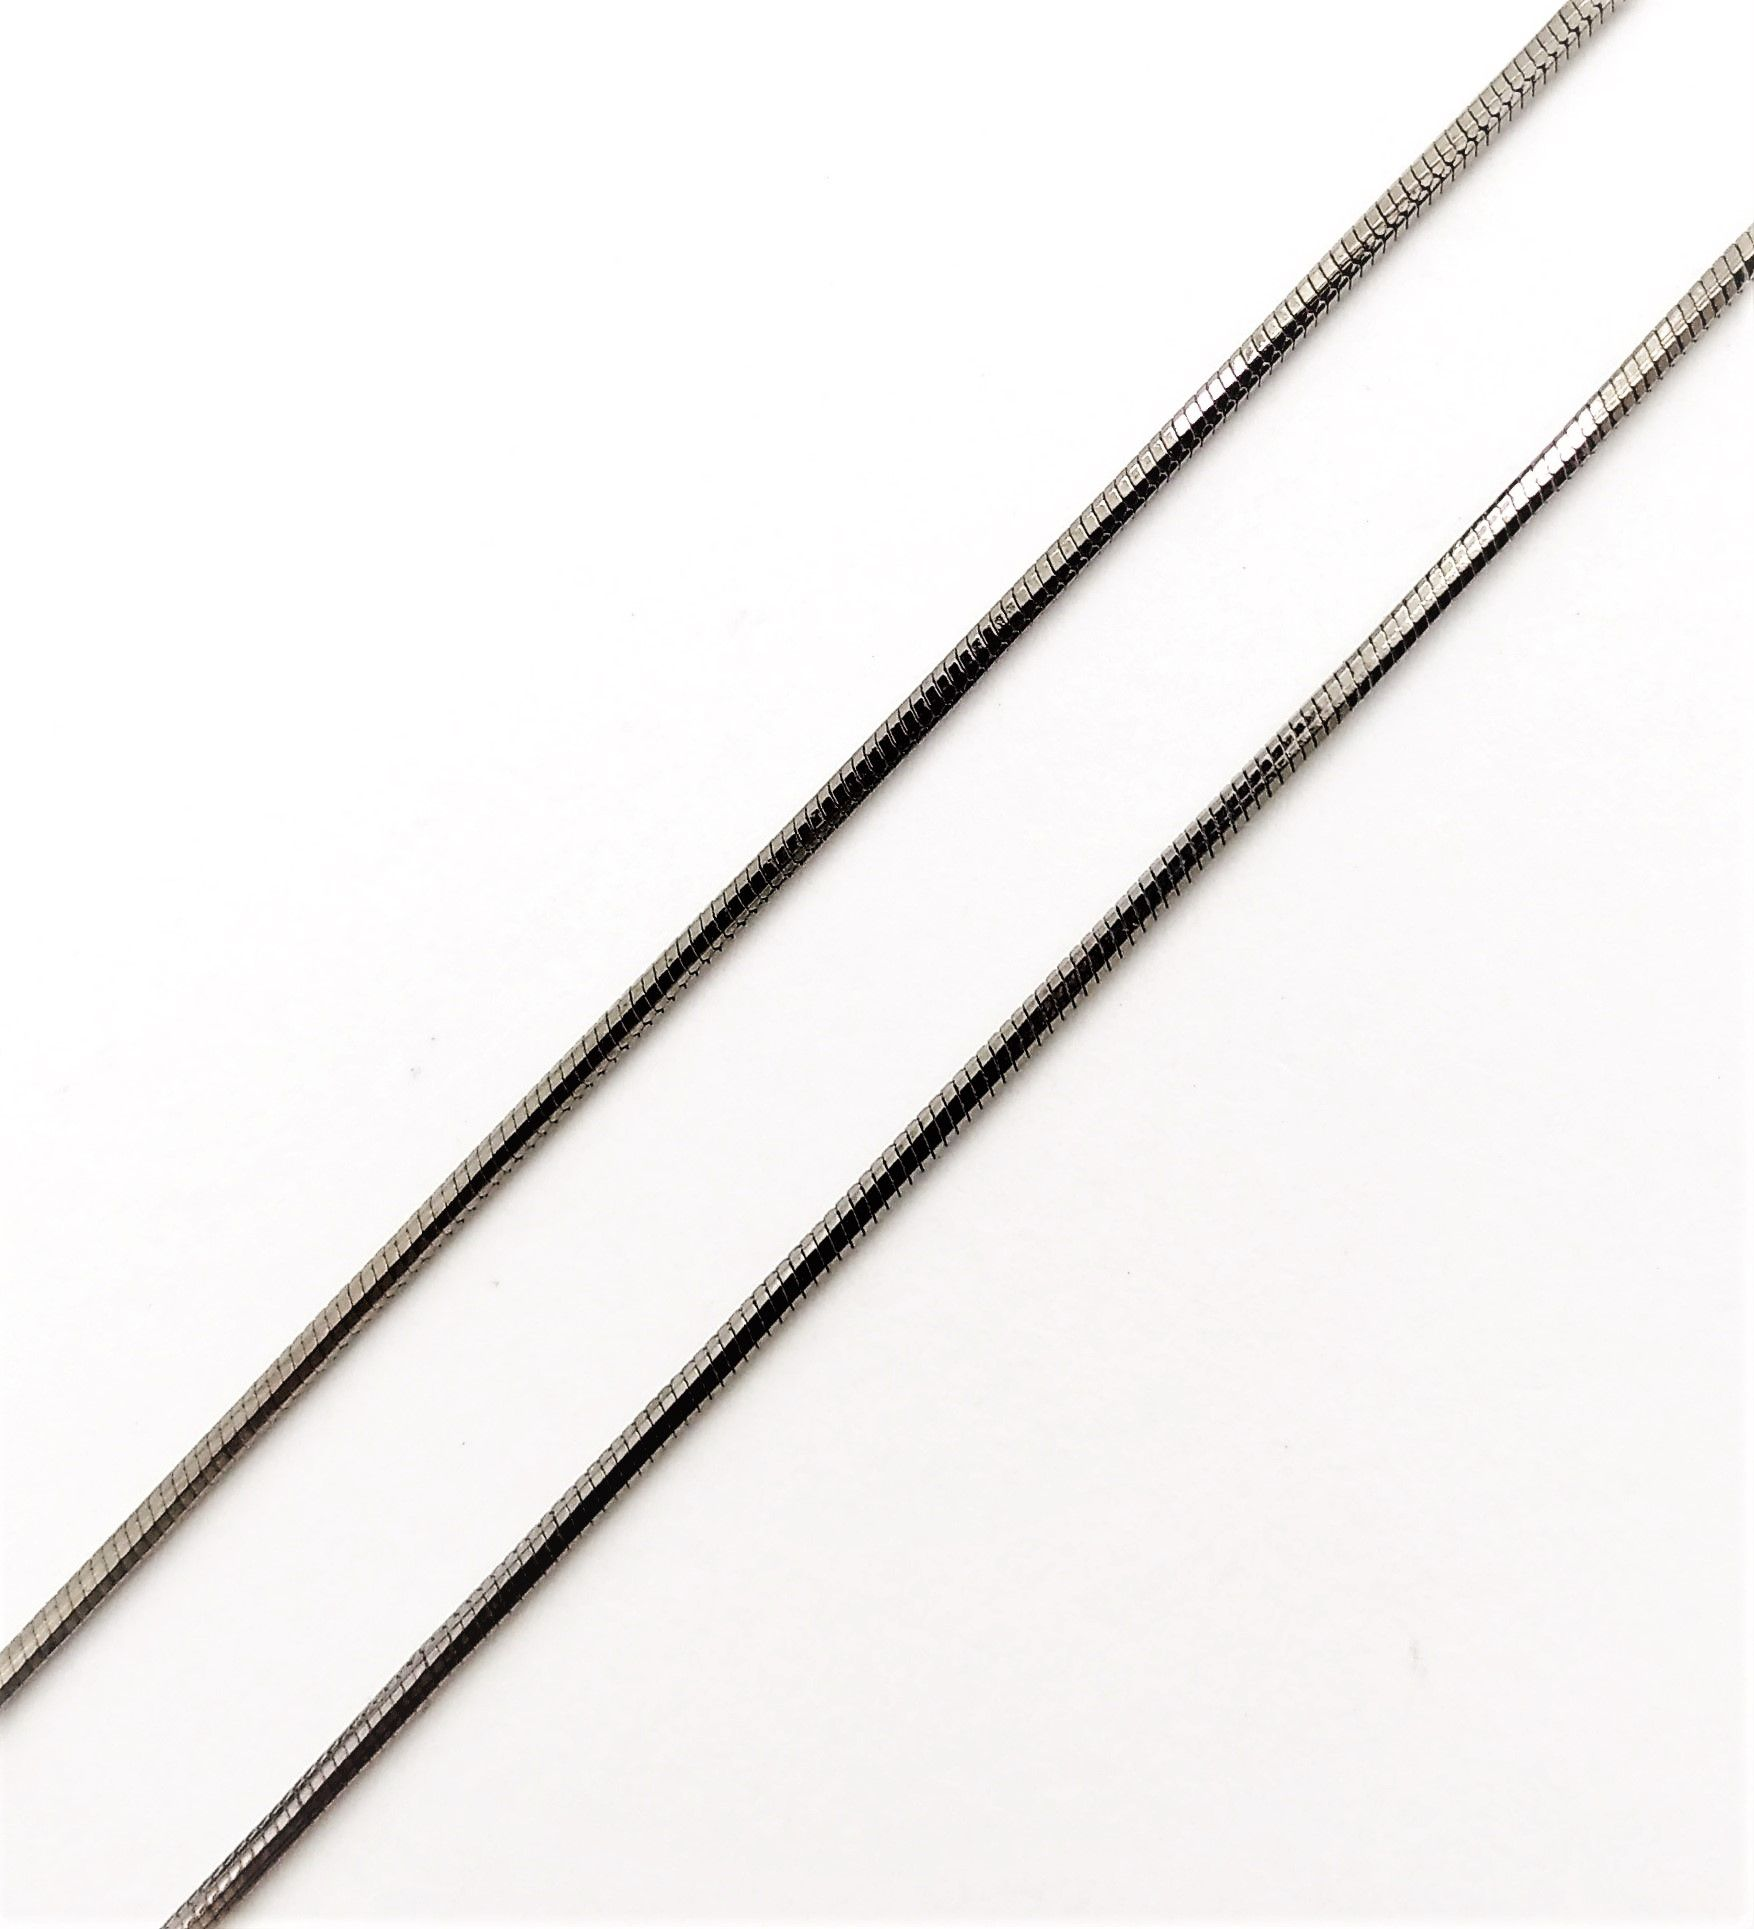 Corrente Cordão Rabo De Rato 1.2 80cm Ródio Negro 4399